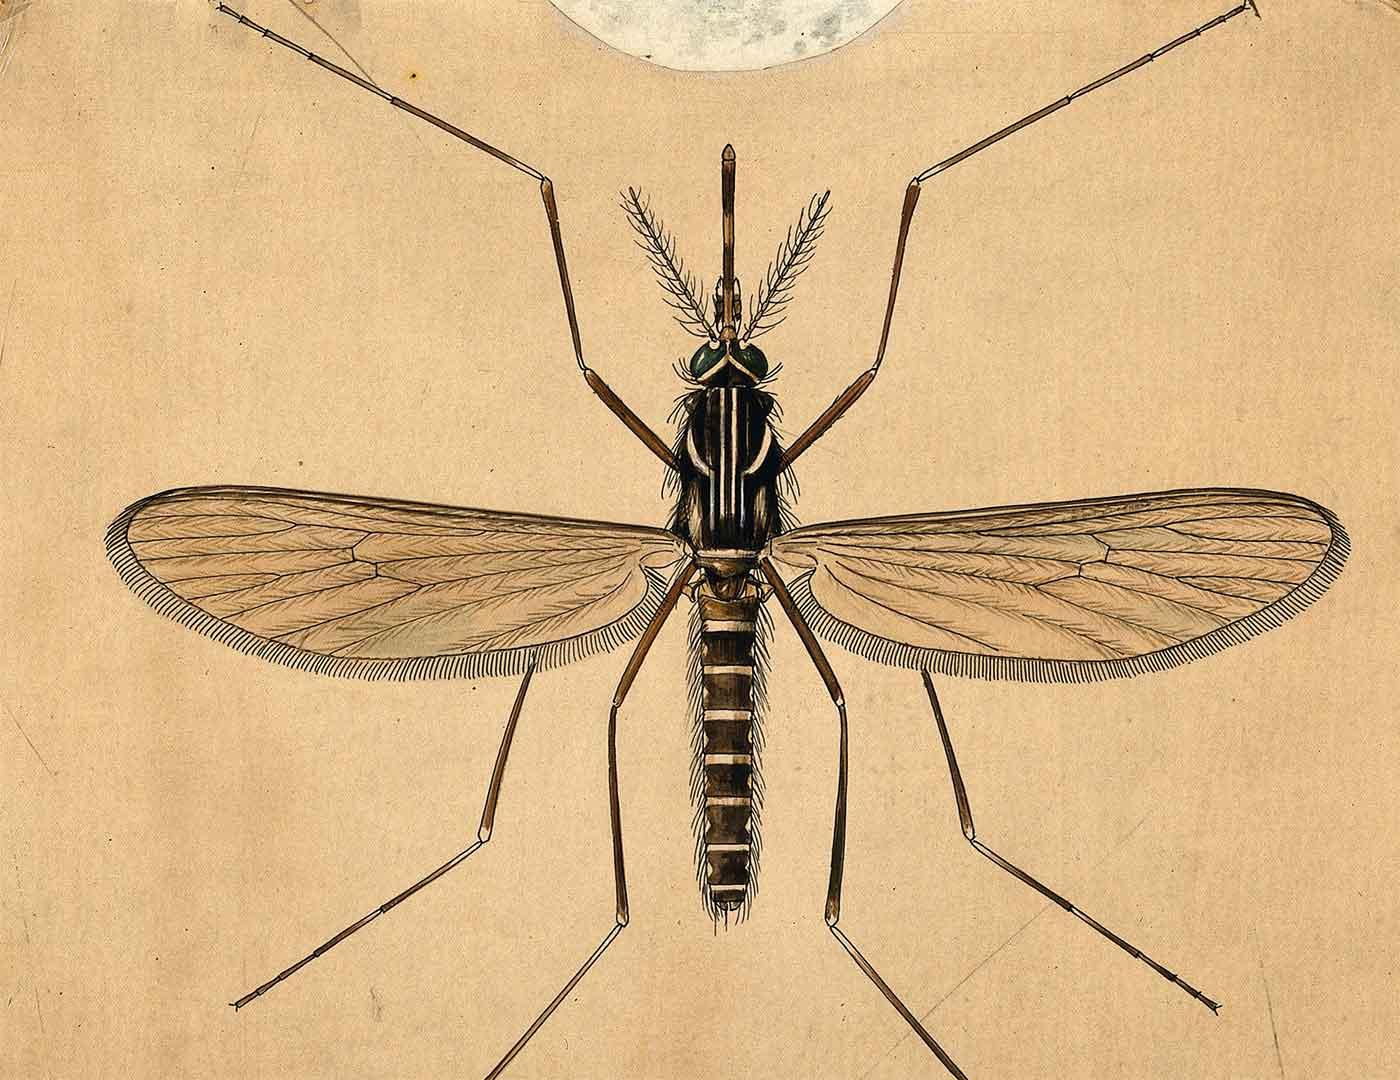 A mosquito (Aedes aegypti), by A.J.E. Terzi.